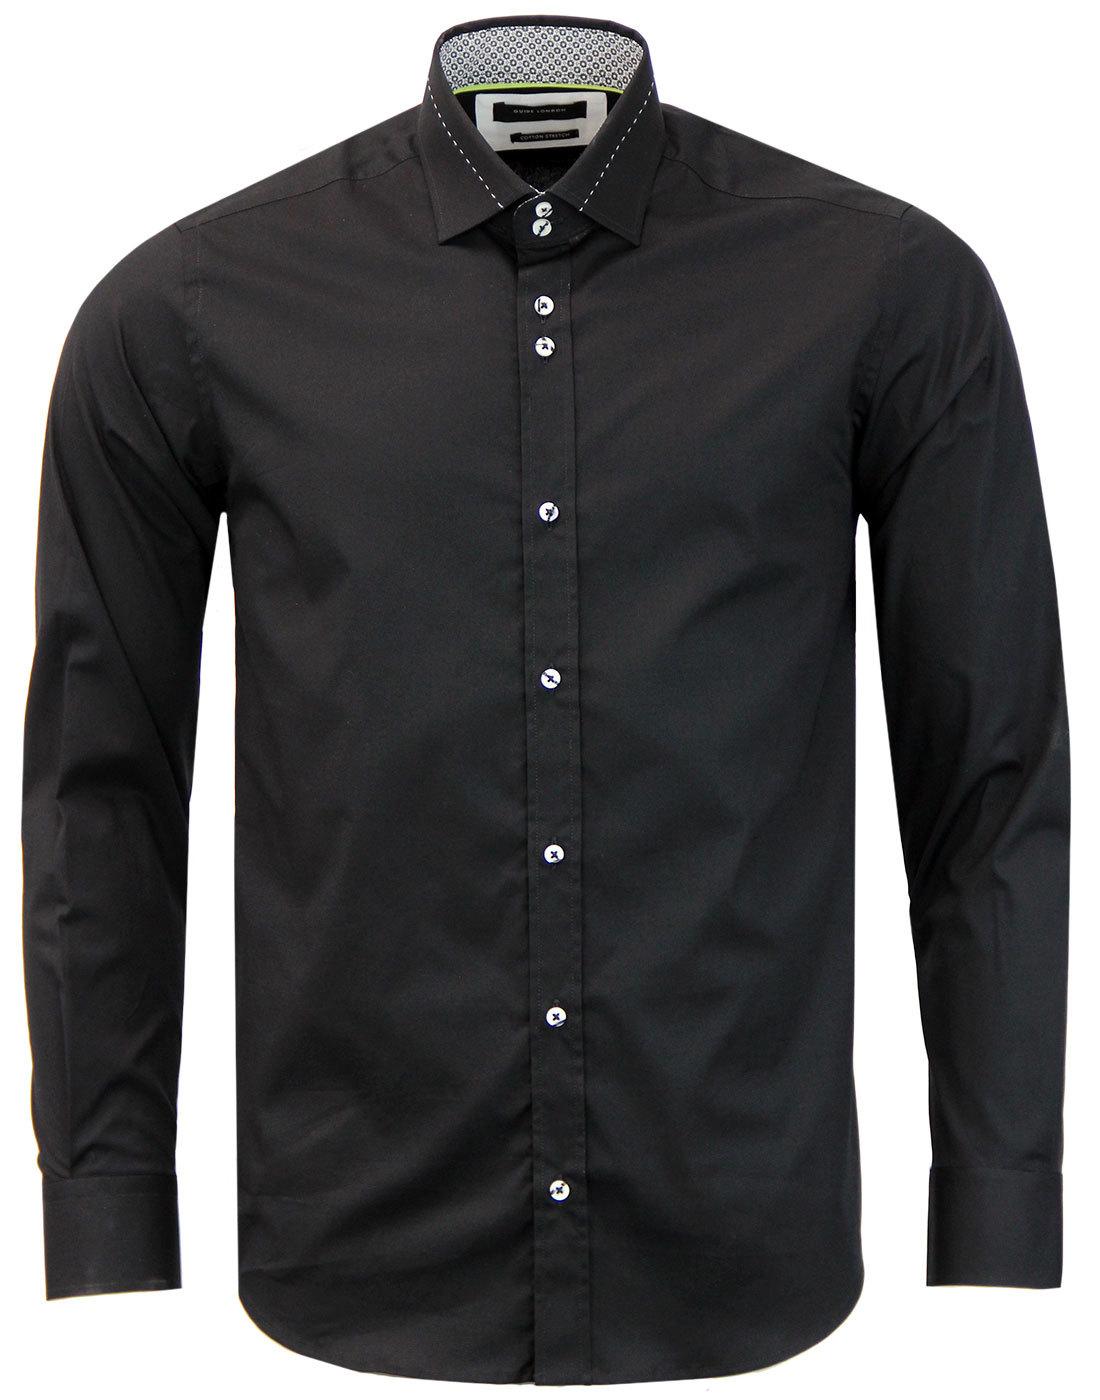 GUIDE LONDON 1960s Mod Stitch Collar Smart Shirt B